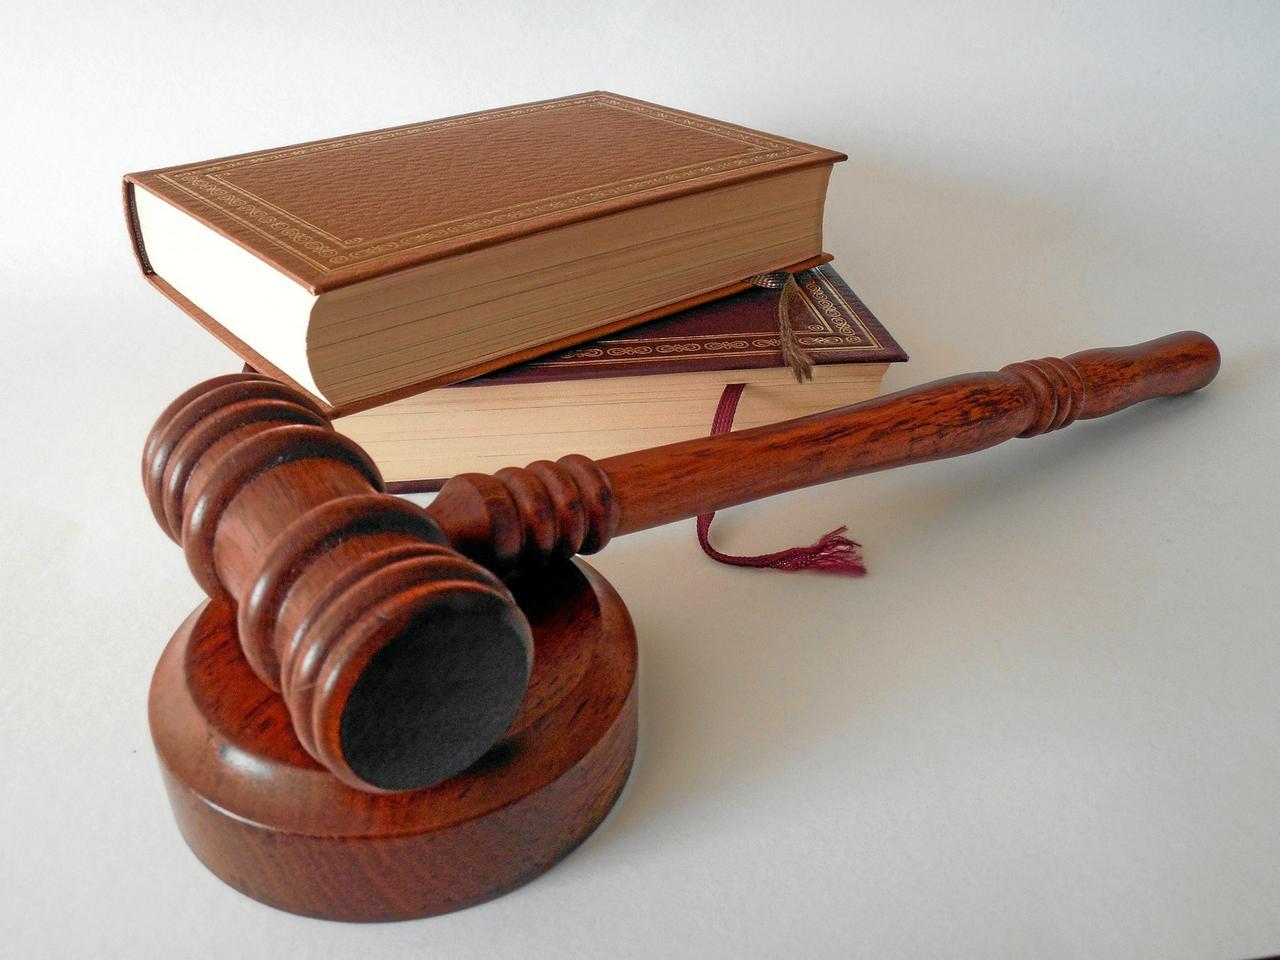 33-jähriger wegen Untreue vor Gericht